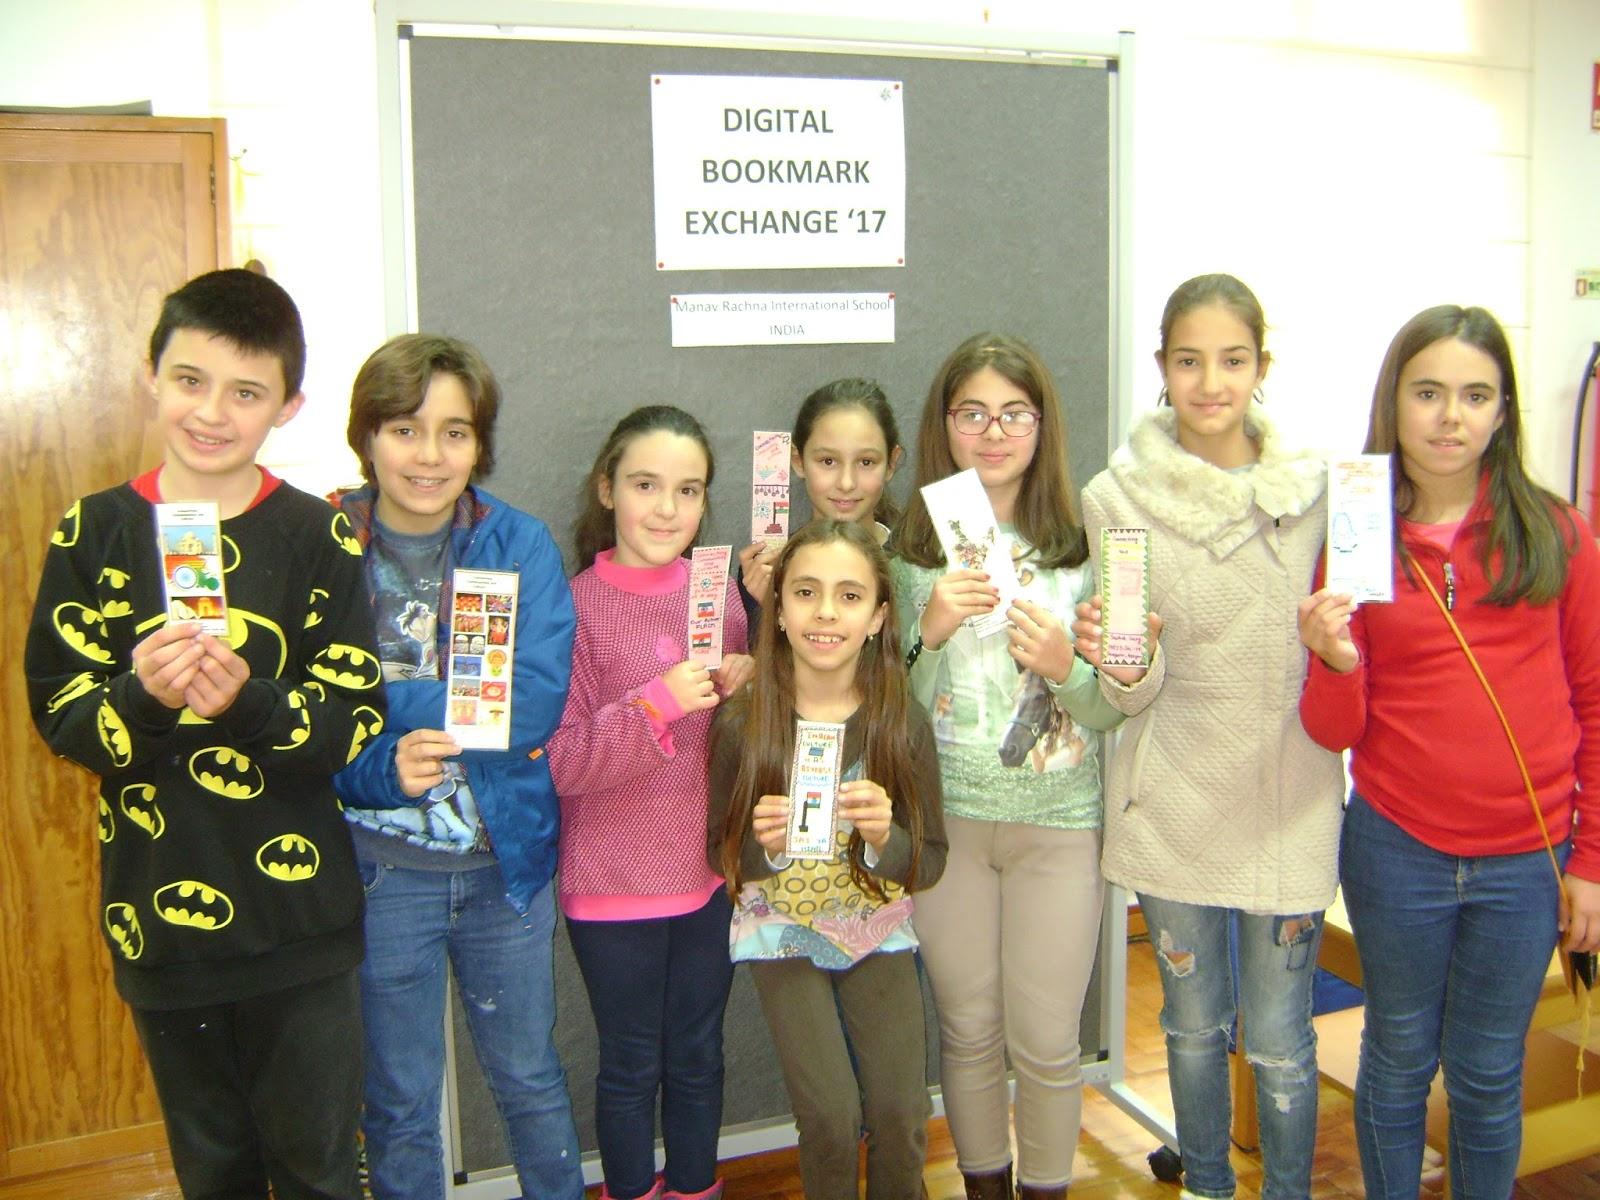 O Sabidinho Digital Bookmark Exchange Project 17